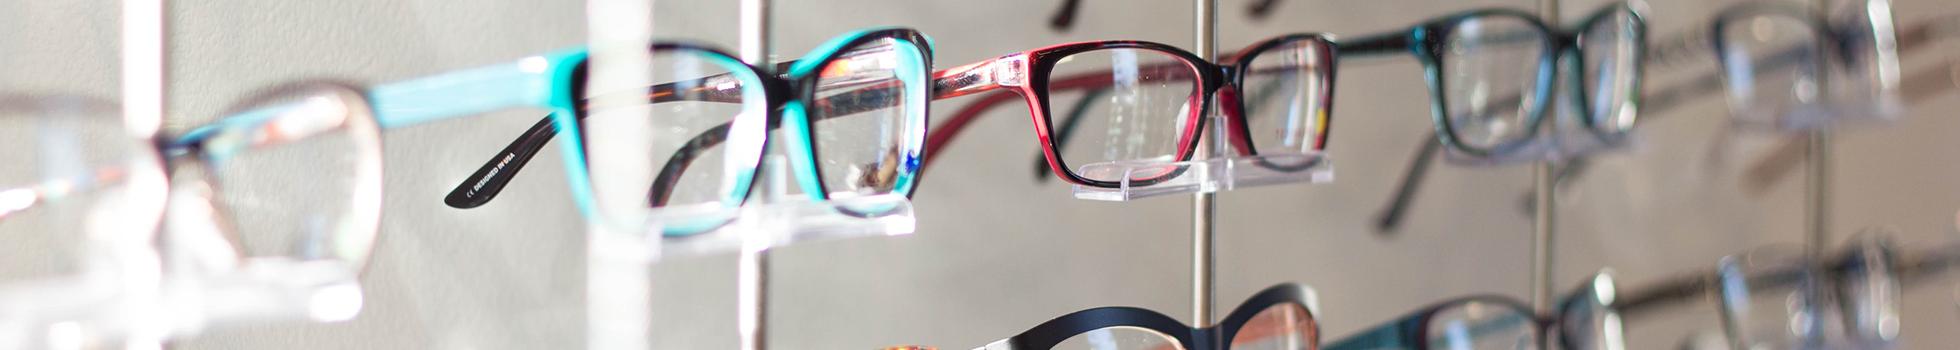 Eye glasses on display.